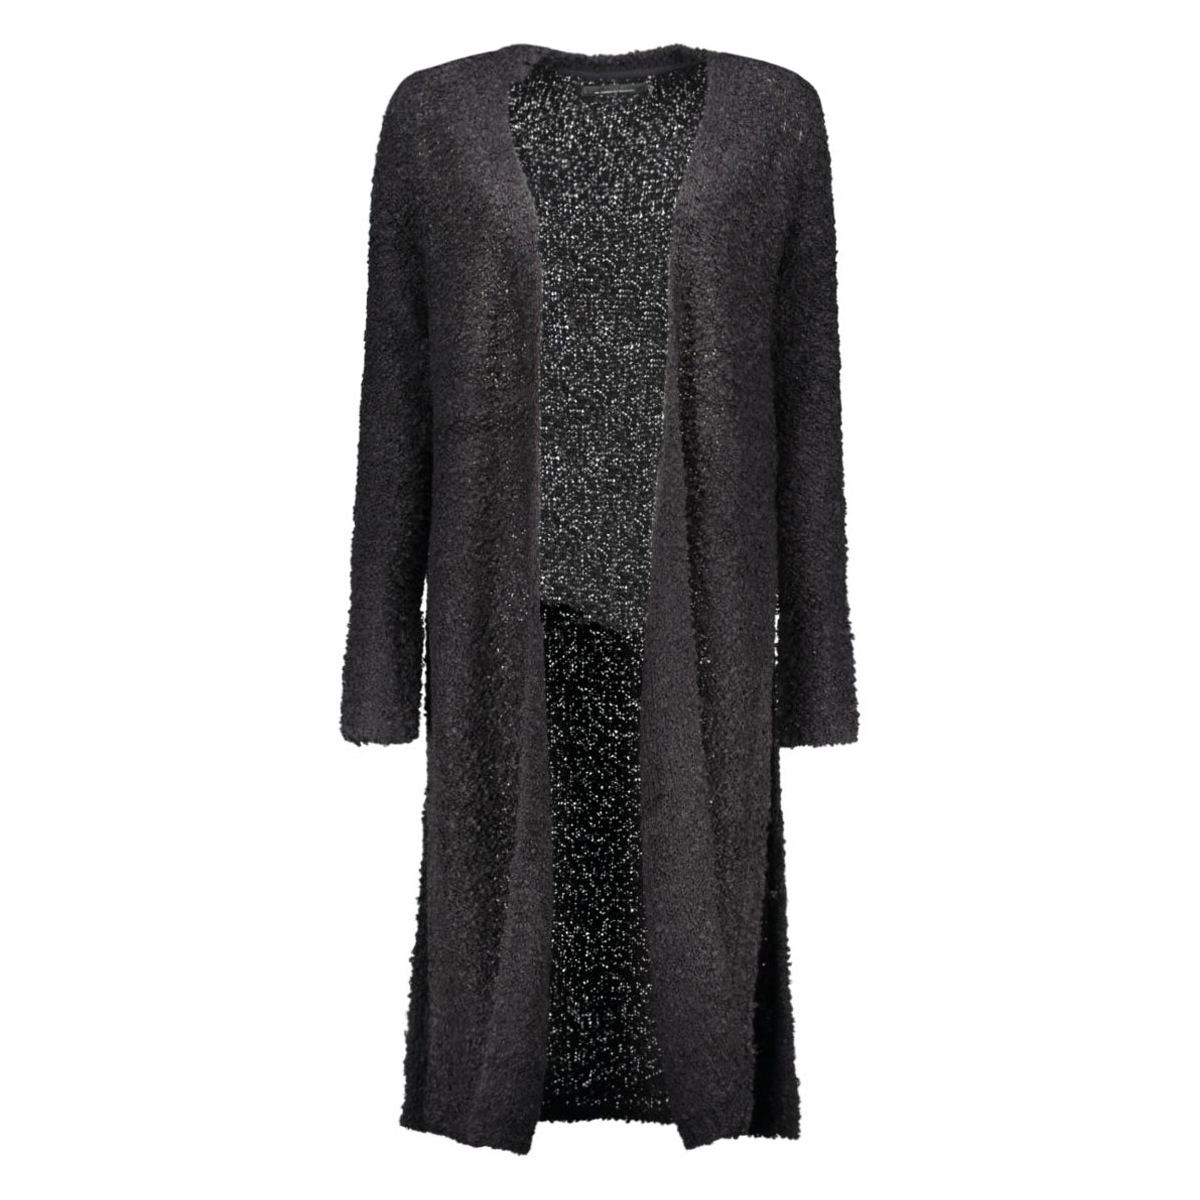 onlnew zadie l/s long cardigan knt 15121236 only vest black